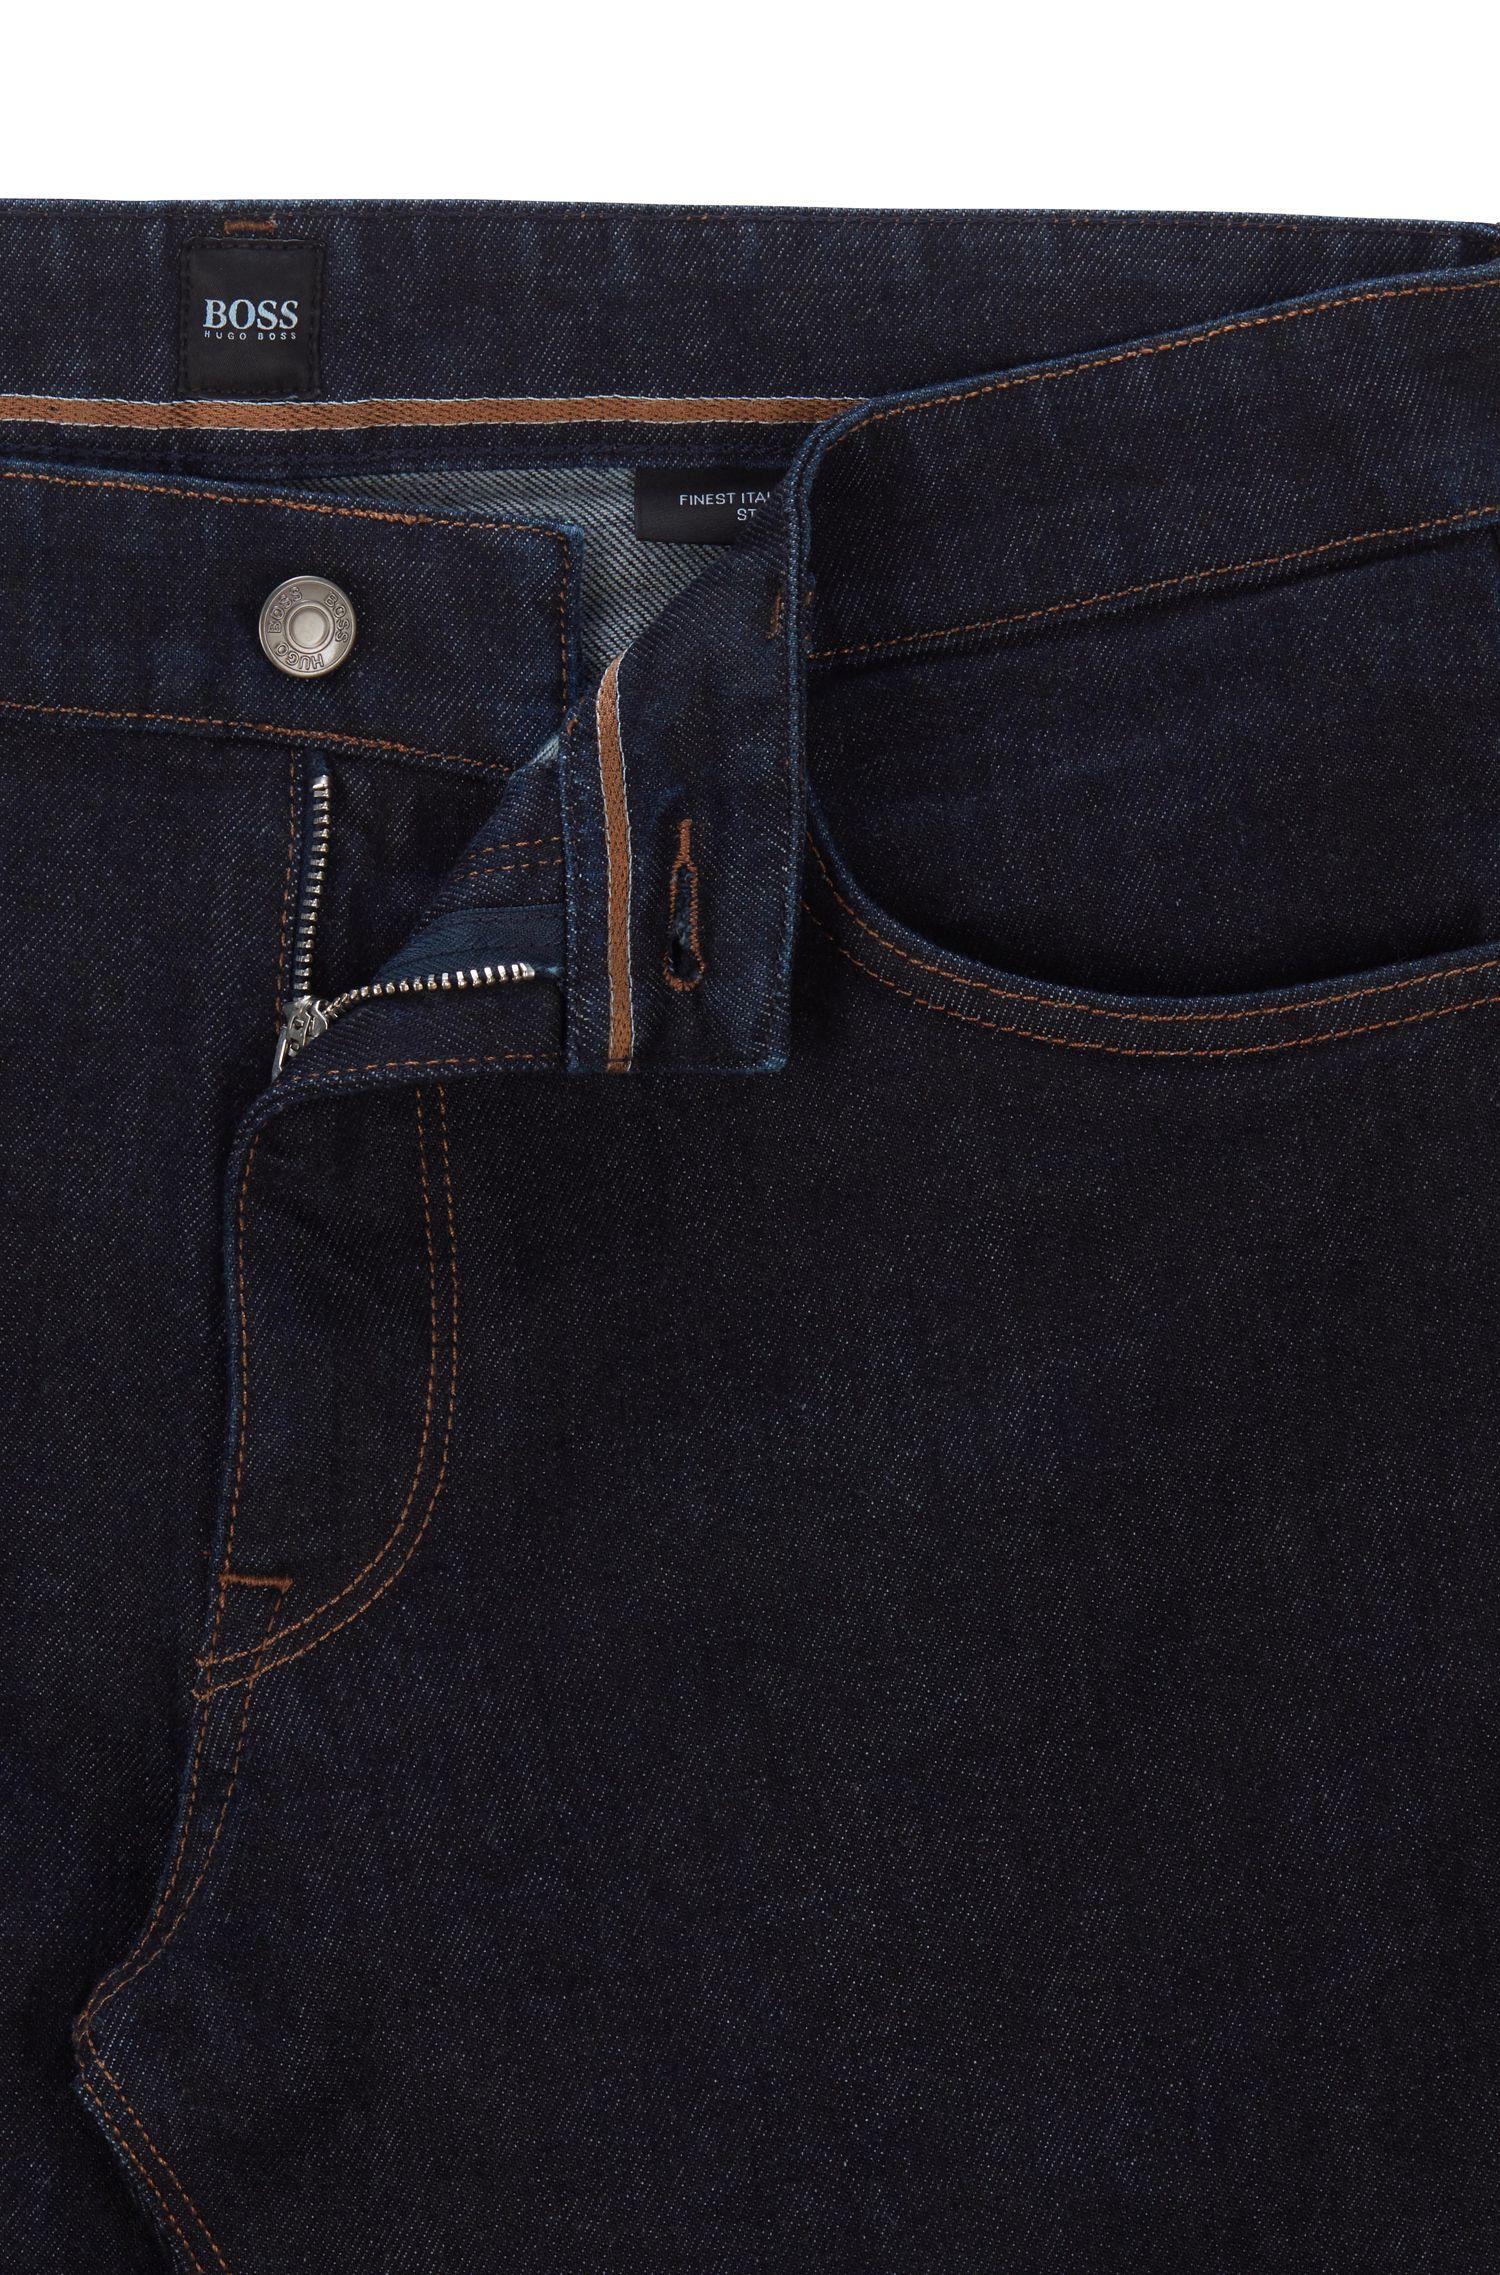 Jean Regular Fit en denim stretch italien indigo, Bleu foncé